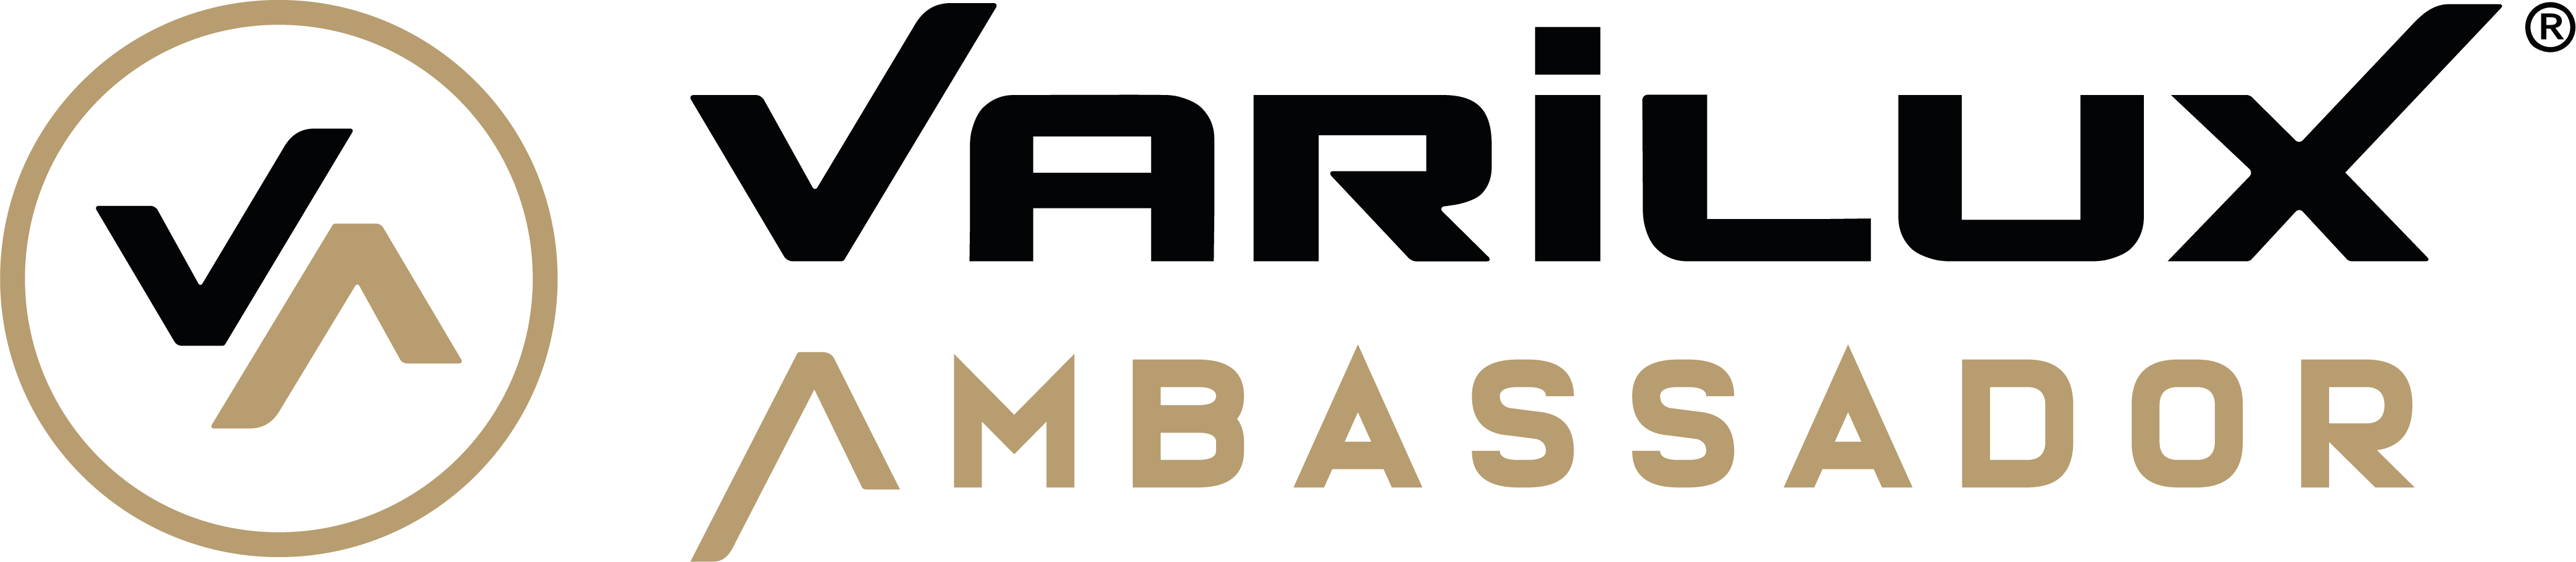 logo_Ambassador_trz negro